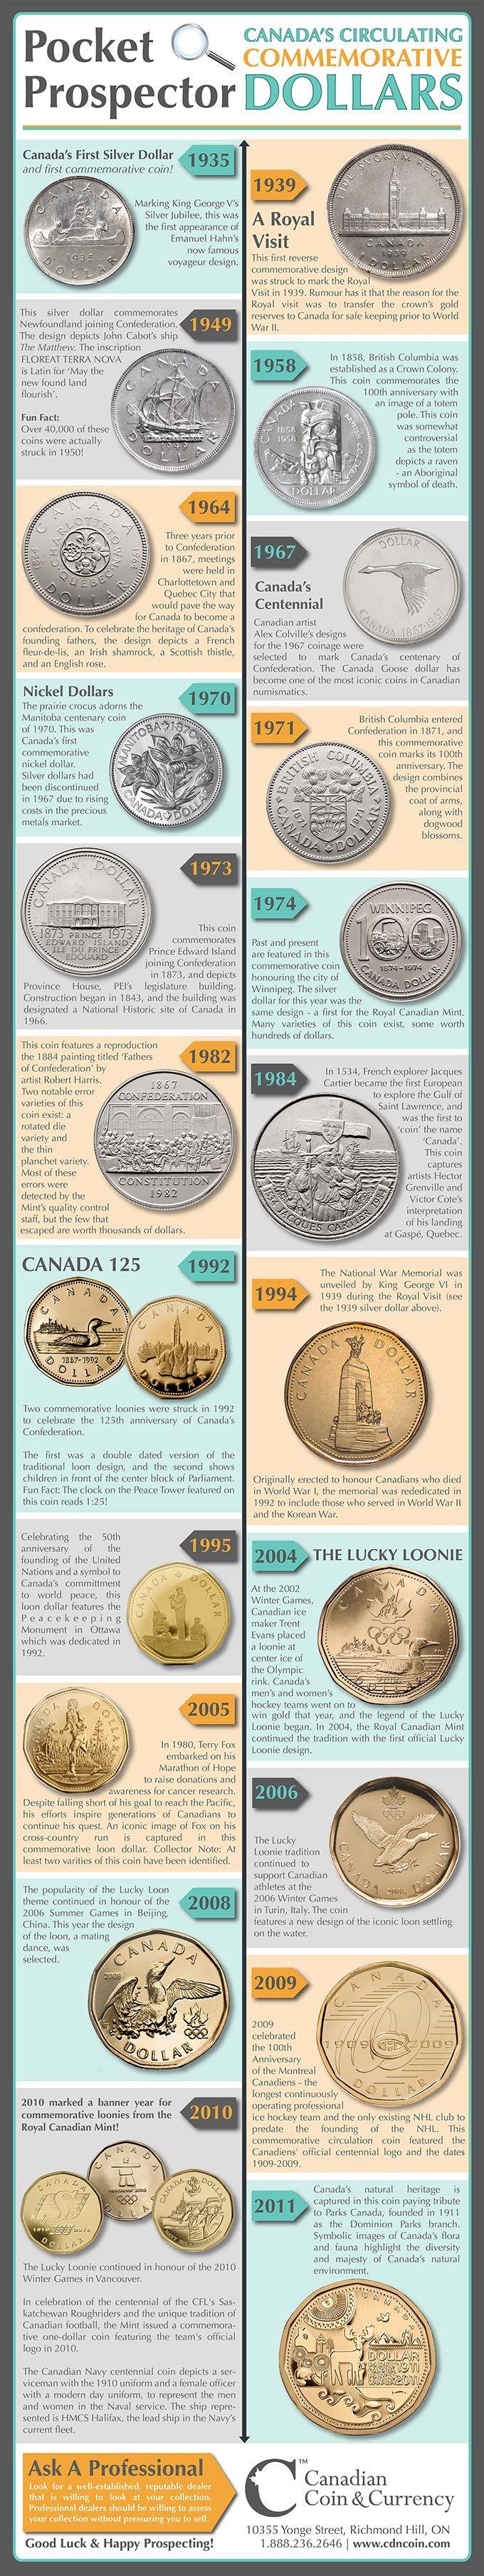 CdnCoin.com Original Infographic: Canada's Circulating Commemorative Dollars